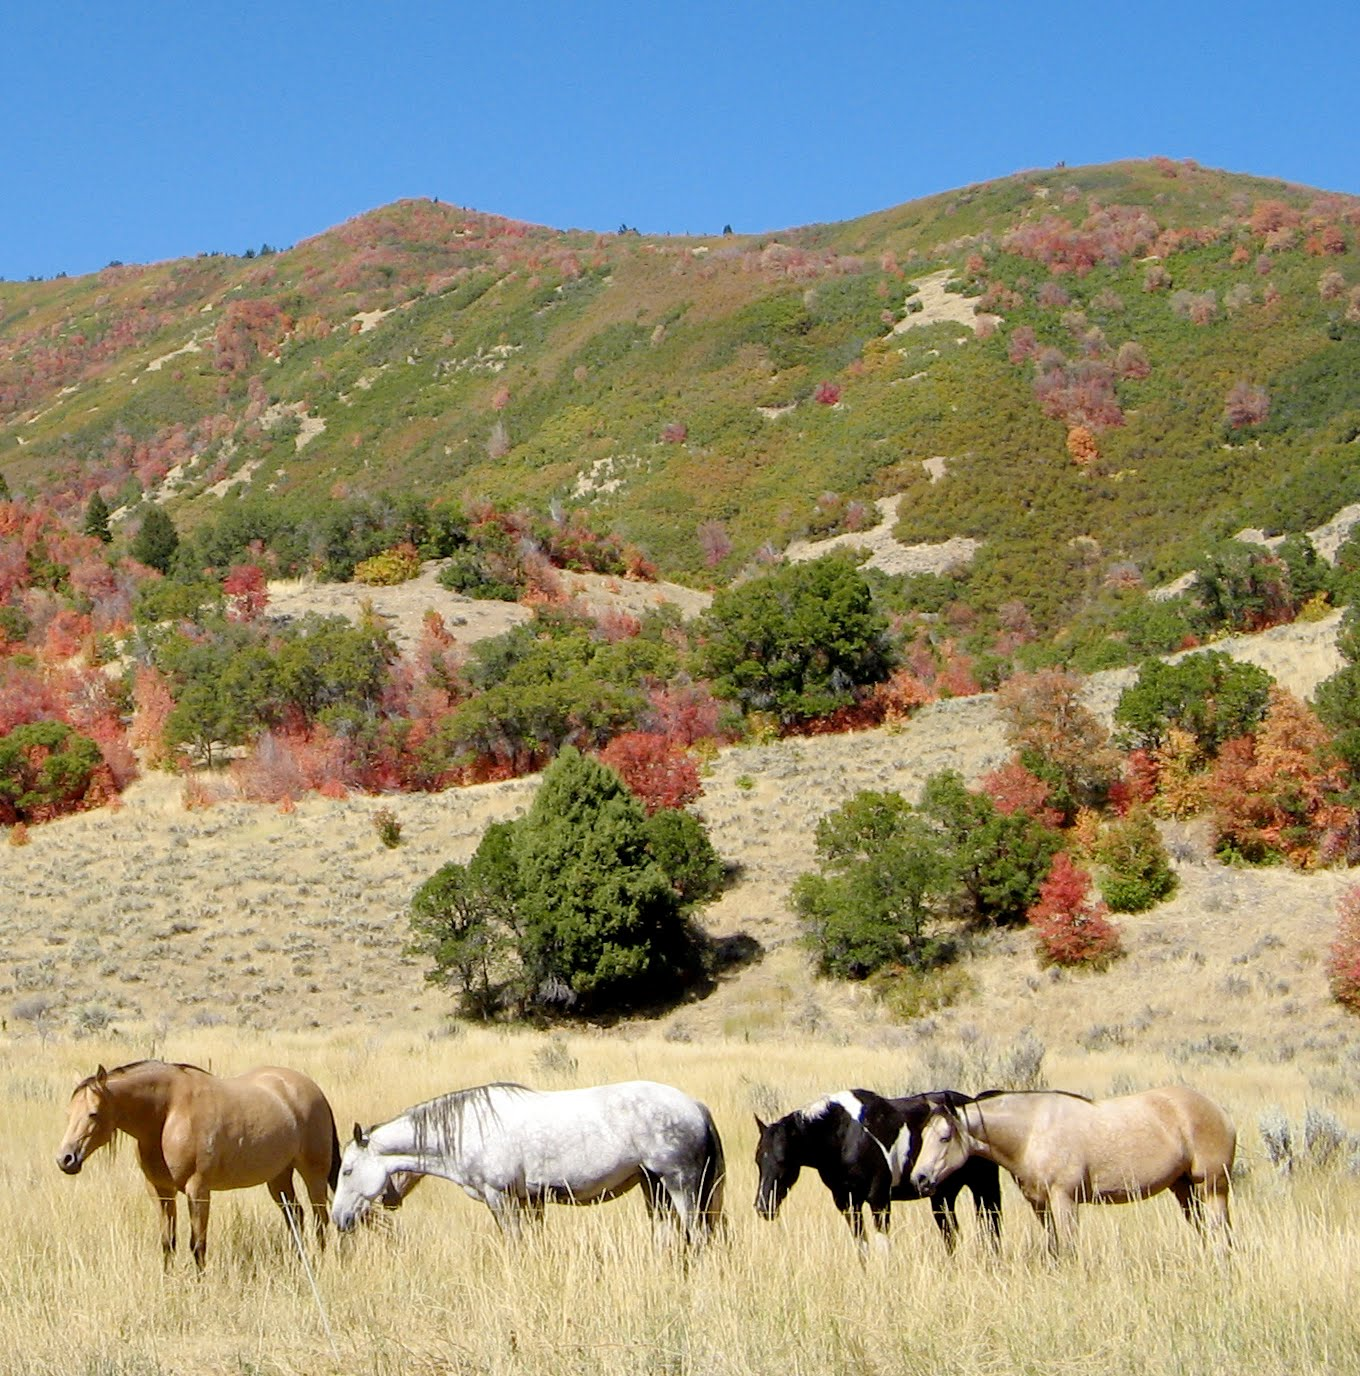 [mares+bred+to+Dallas+2009]